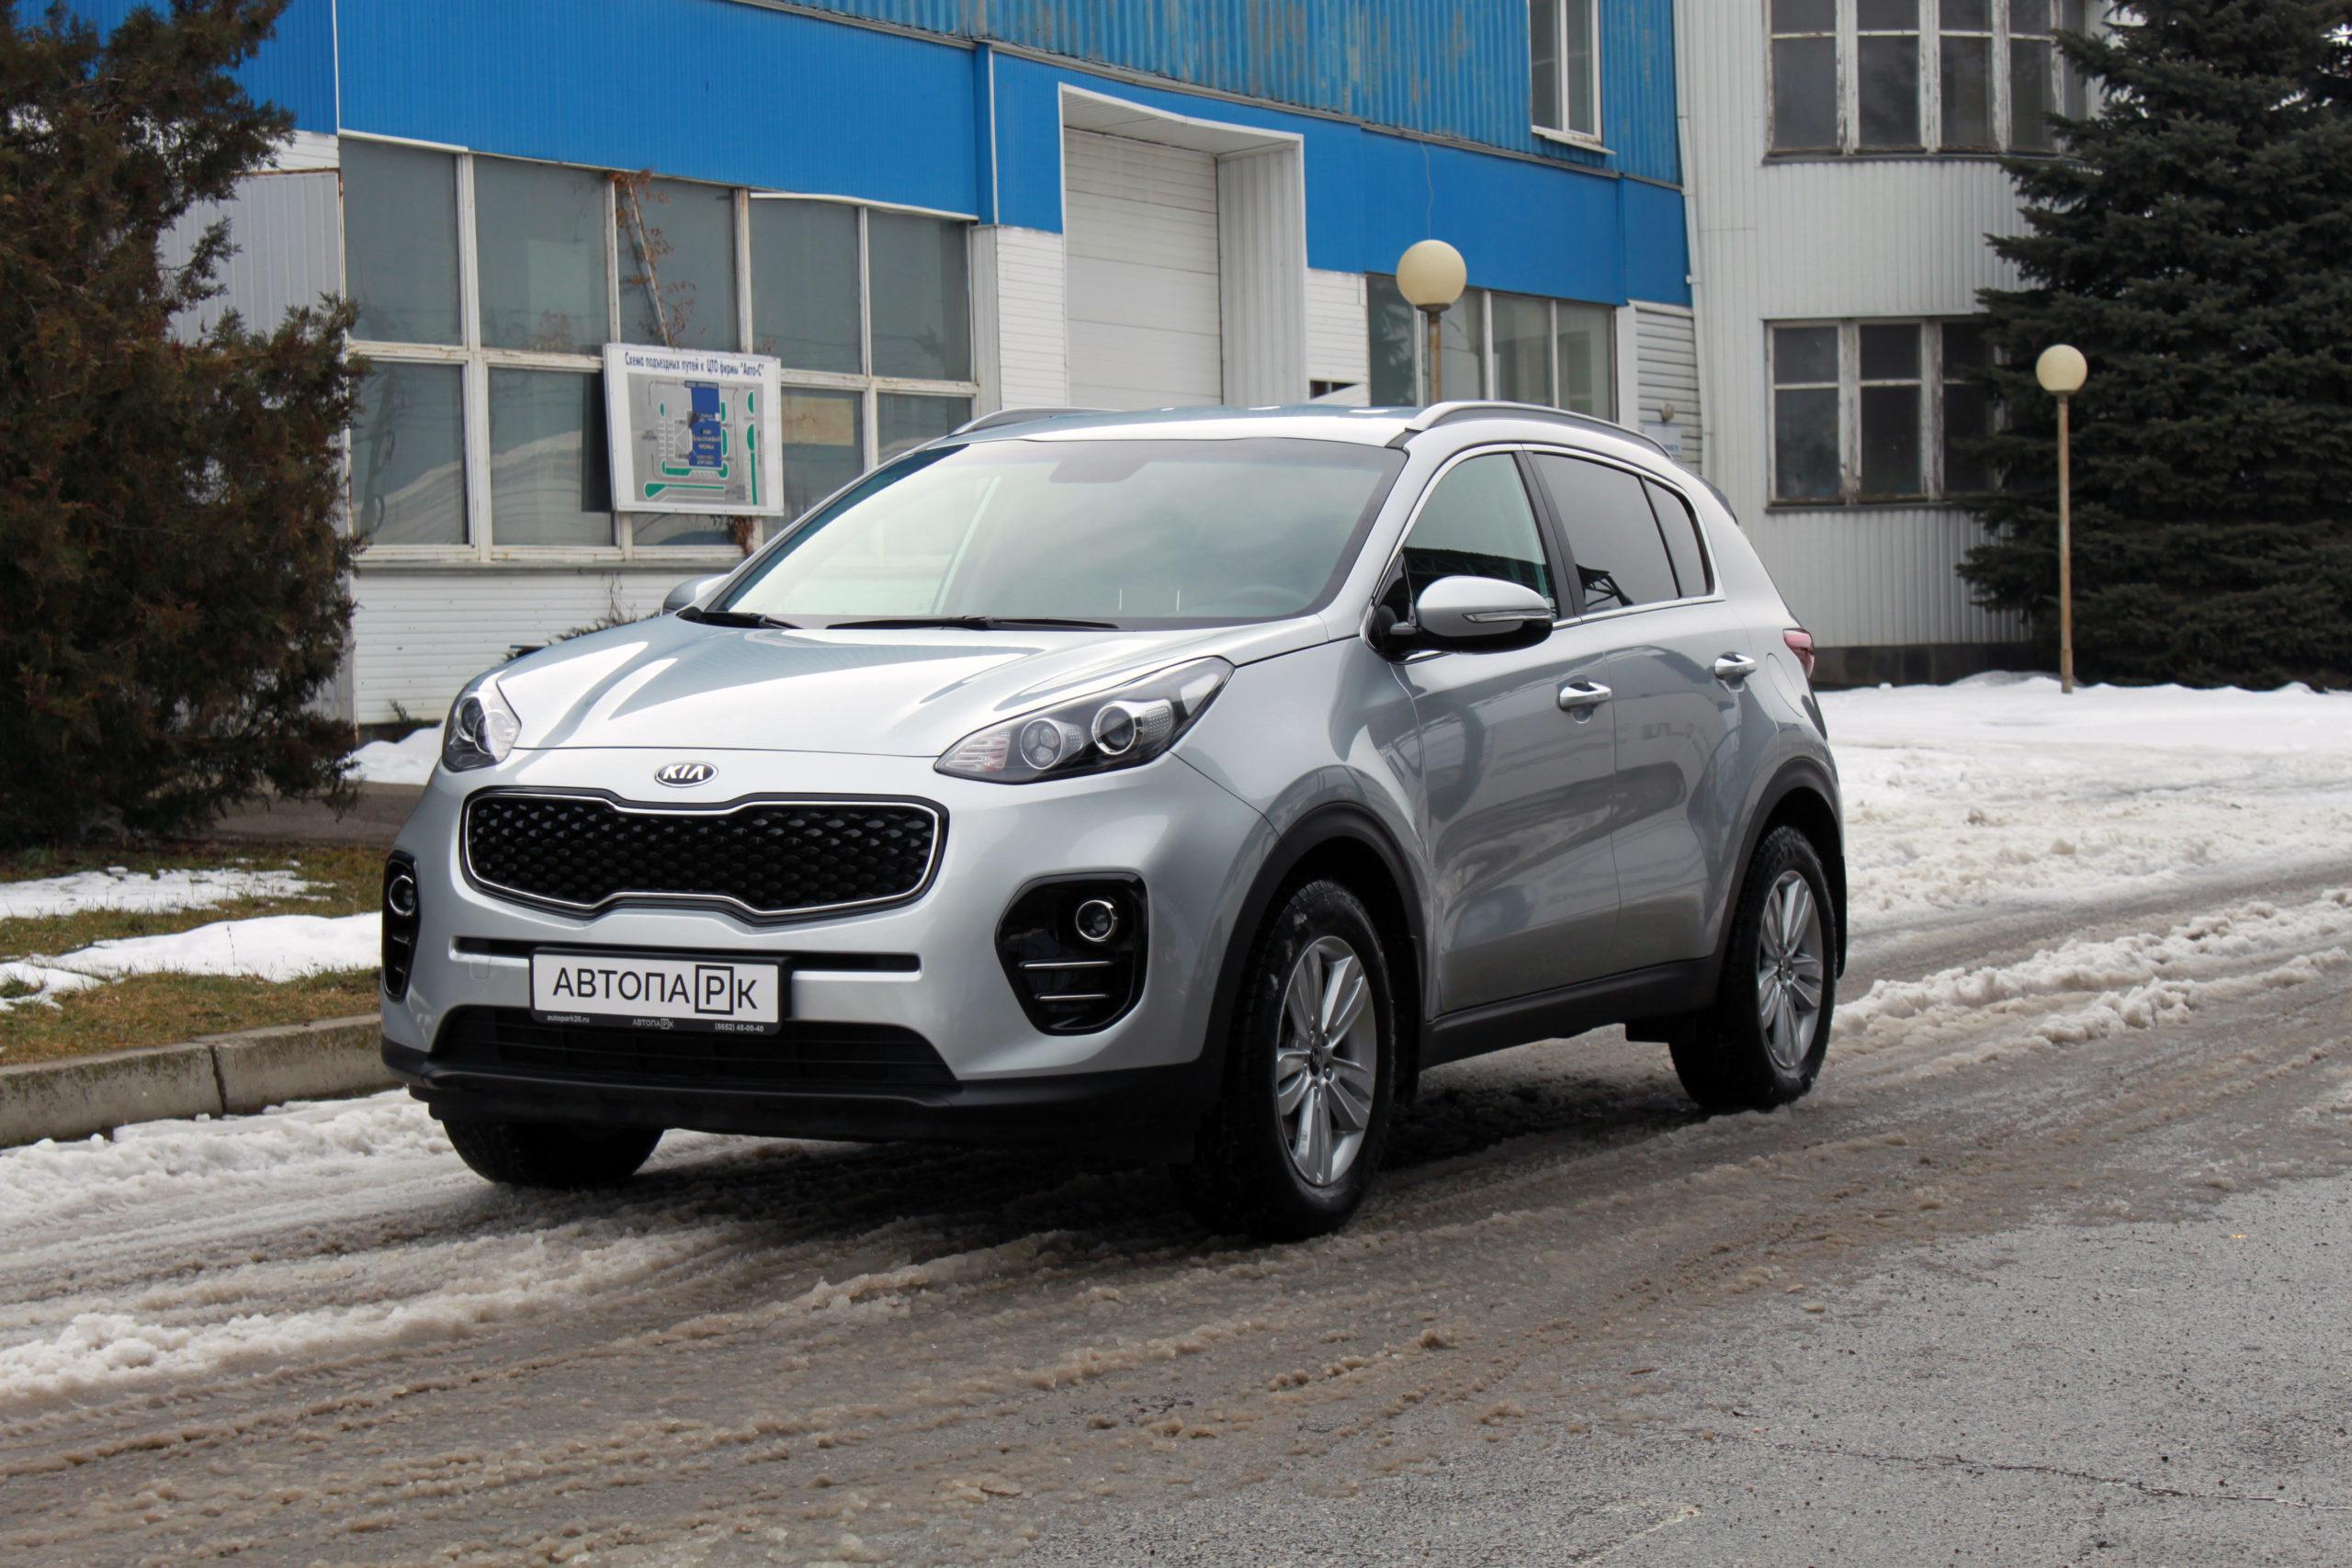 Купить KIA Sportage (Серебристый ) - Автопарк Ставрополь